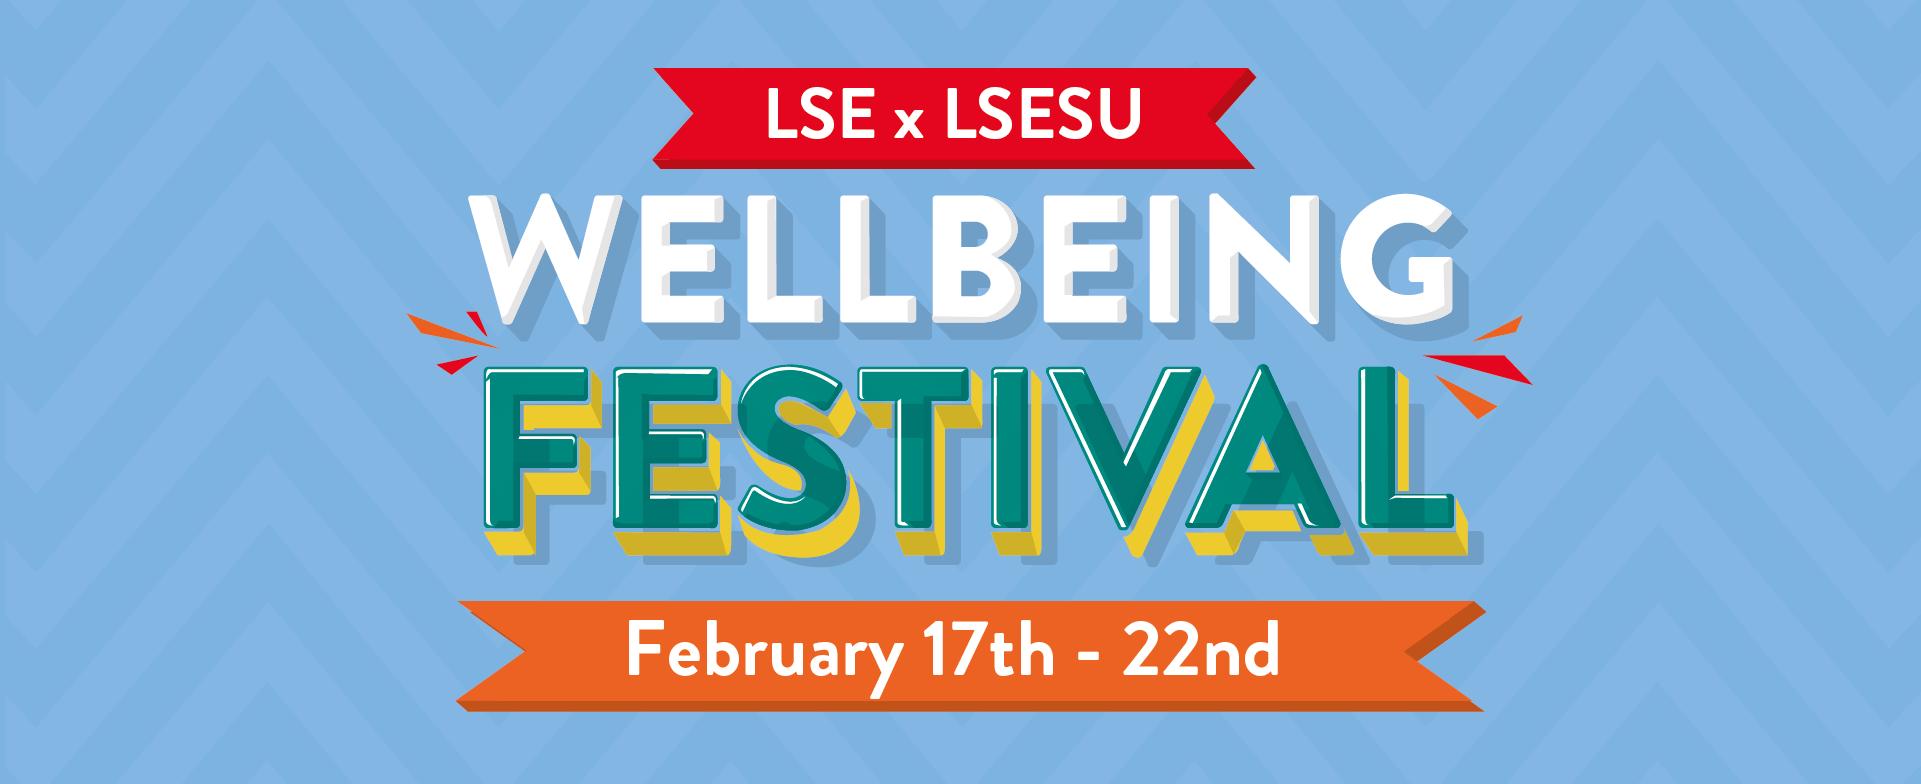 Wellbeing Festival LSExLSESU